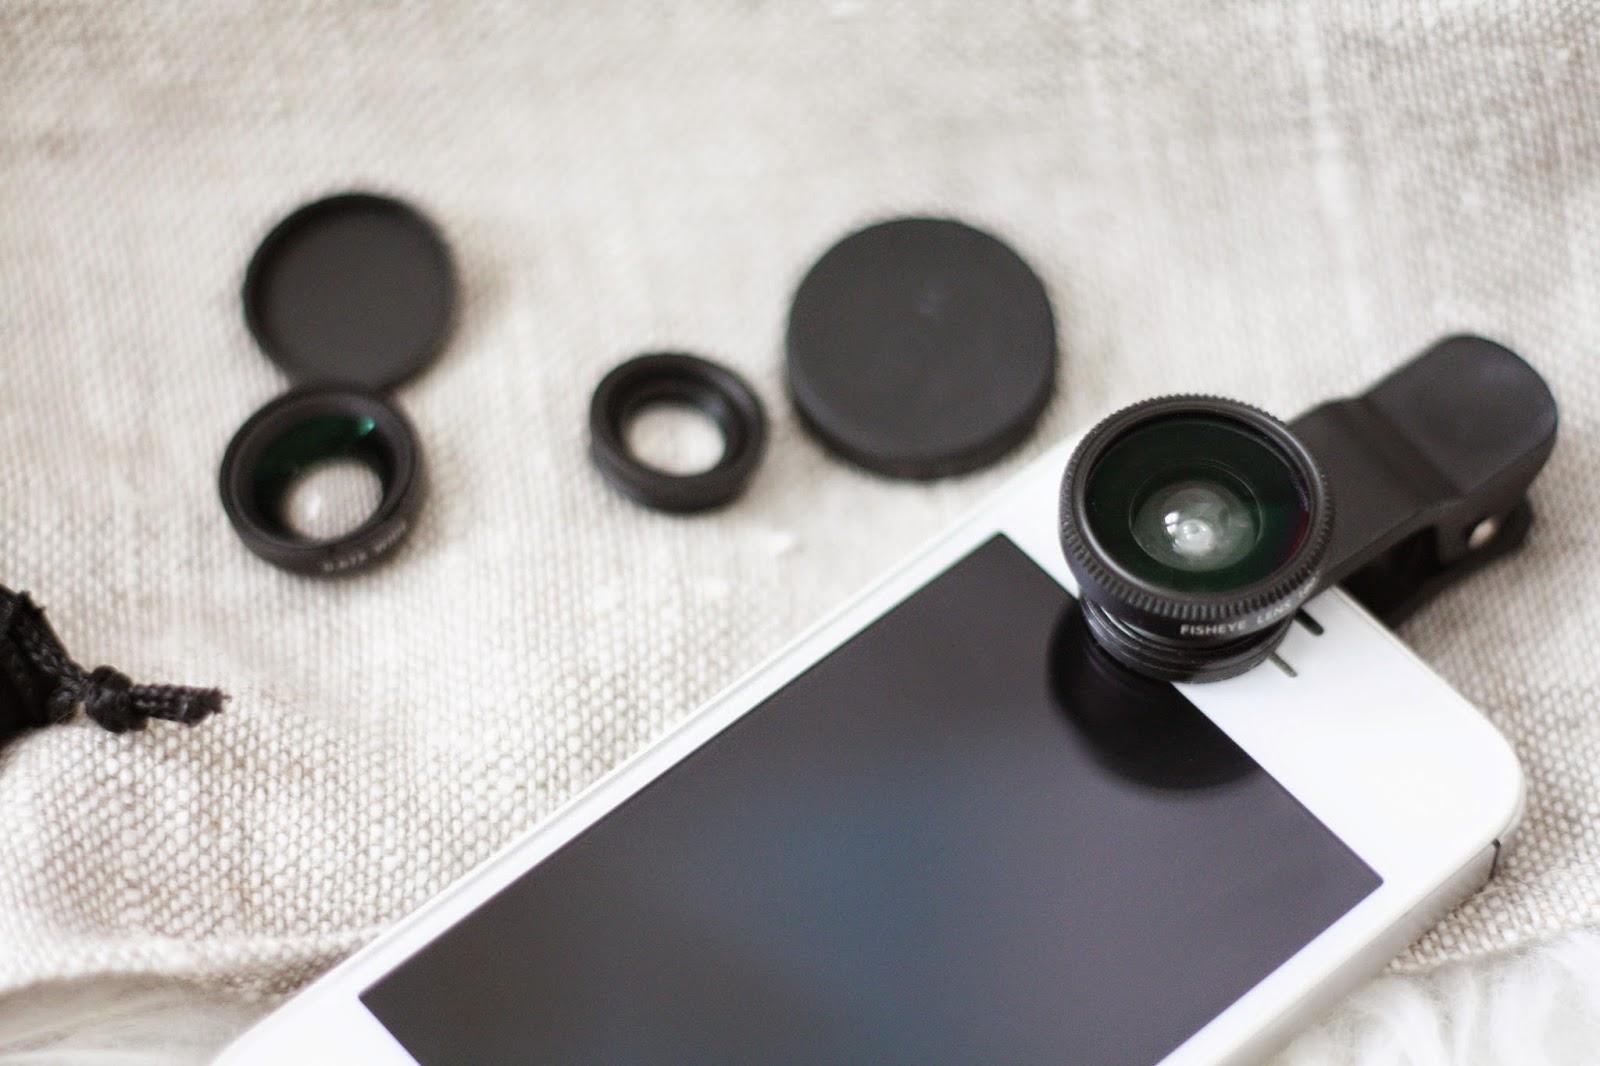 External lens kit review